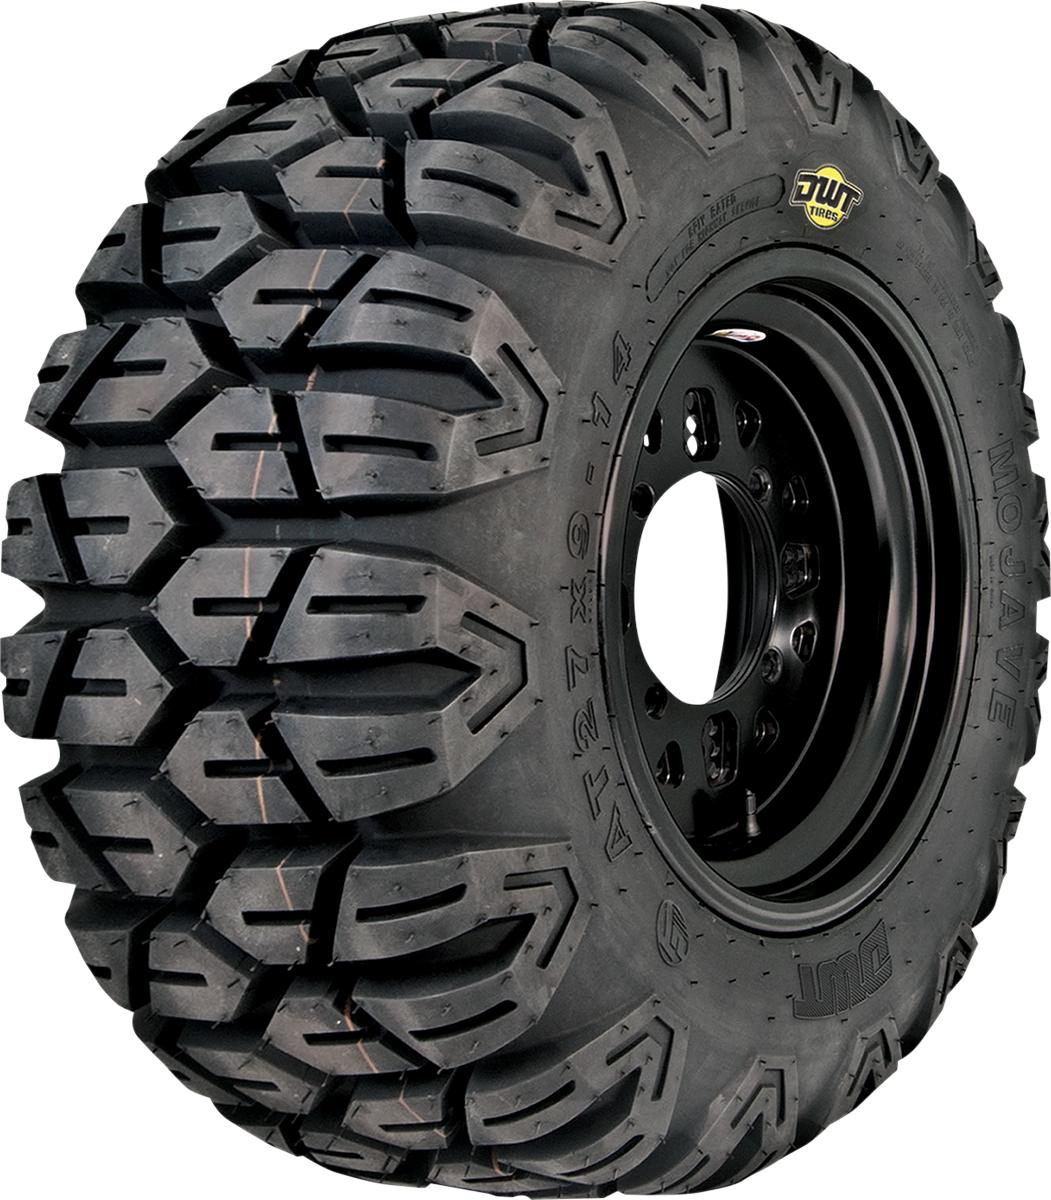 Mojave Utility Tires